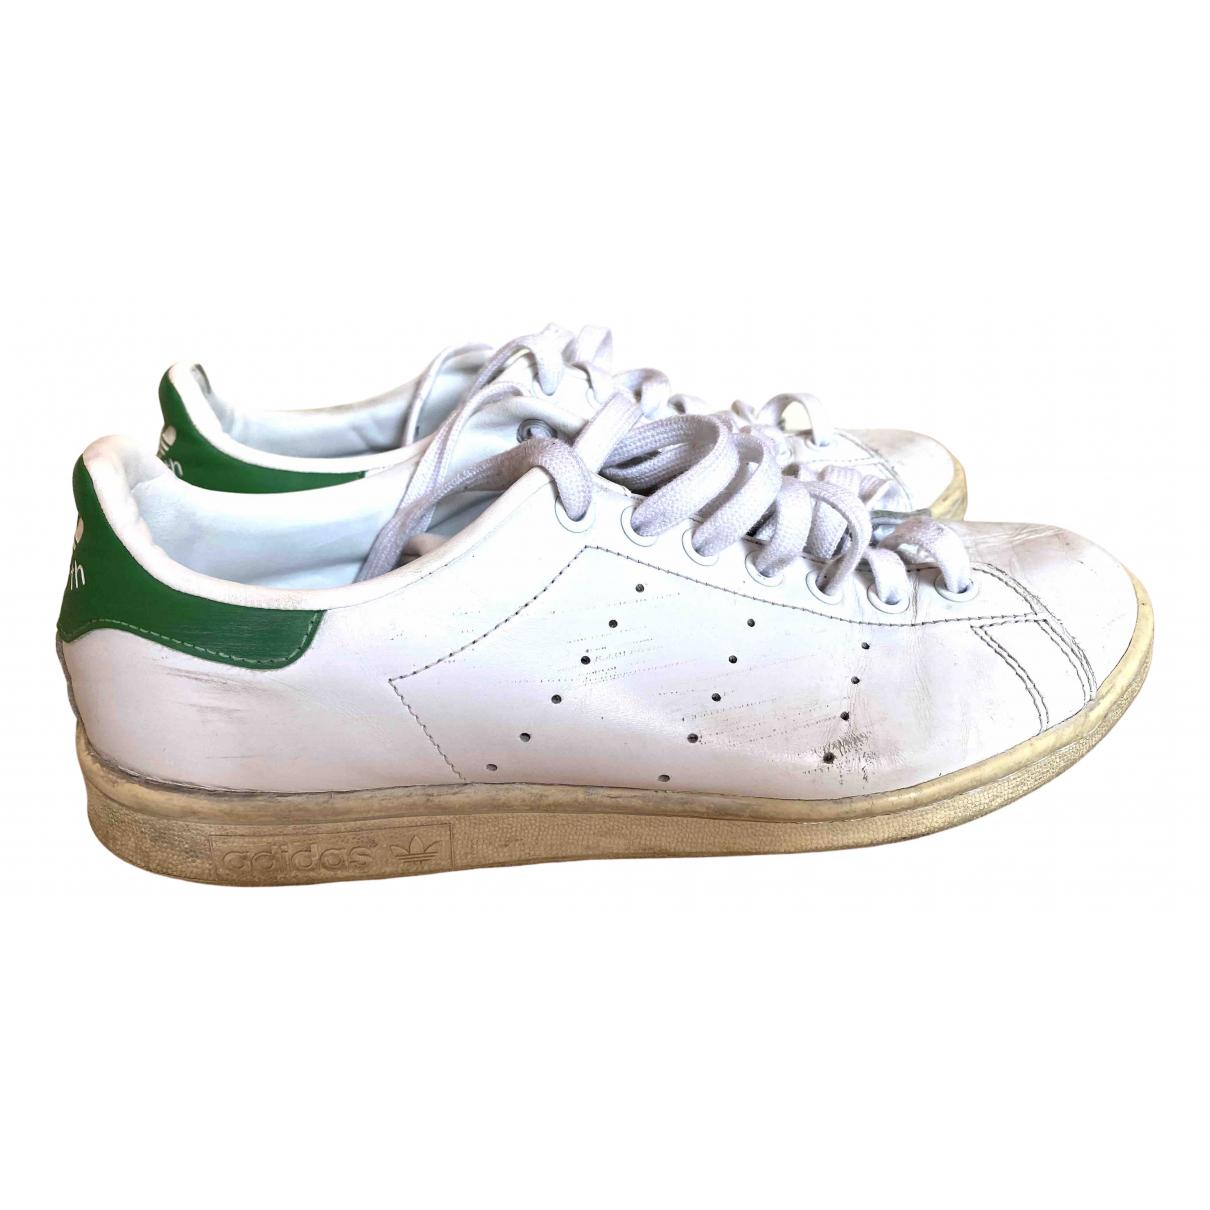 Adidas - Baskets Stan Smith pour homme en cuir - blanc